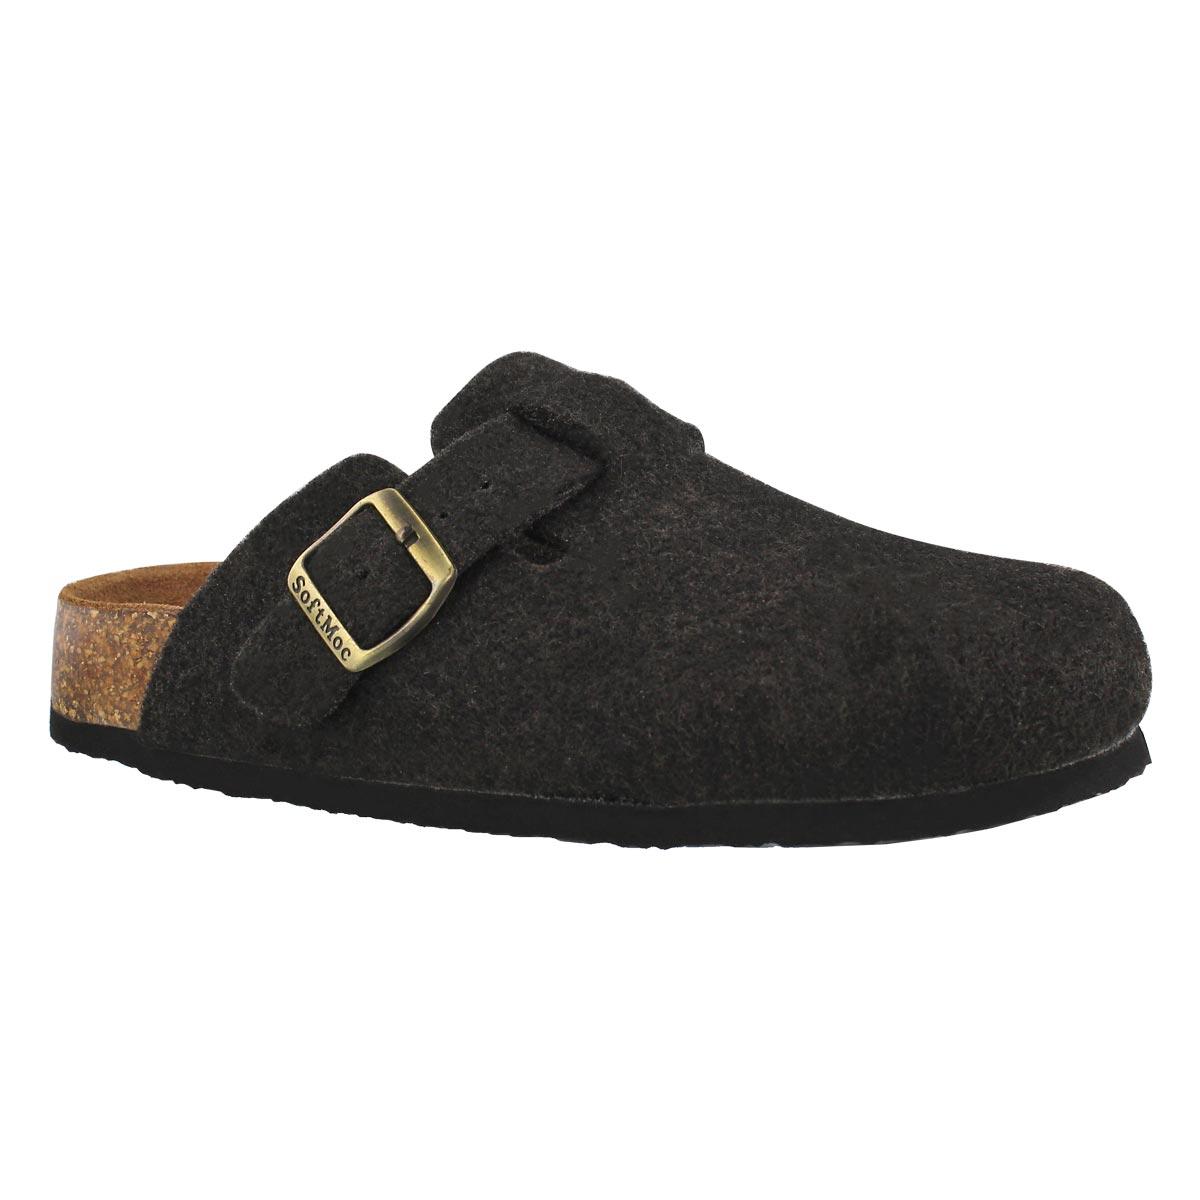 Lds Ayr 5 black wool casual clog